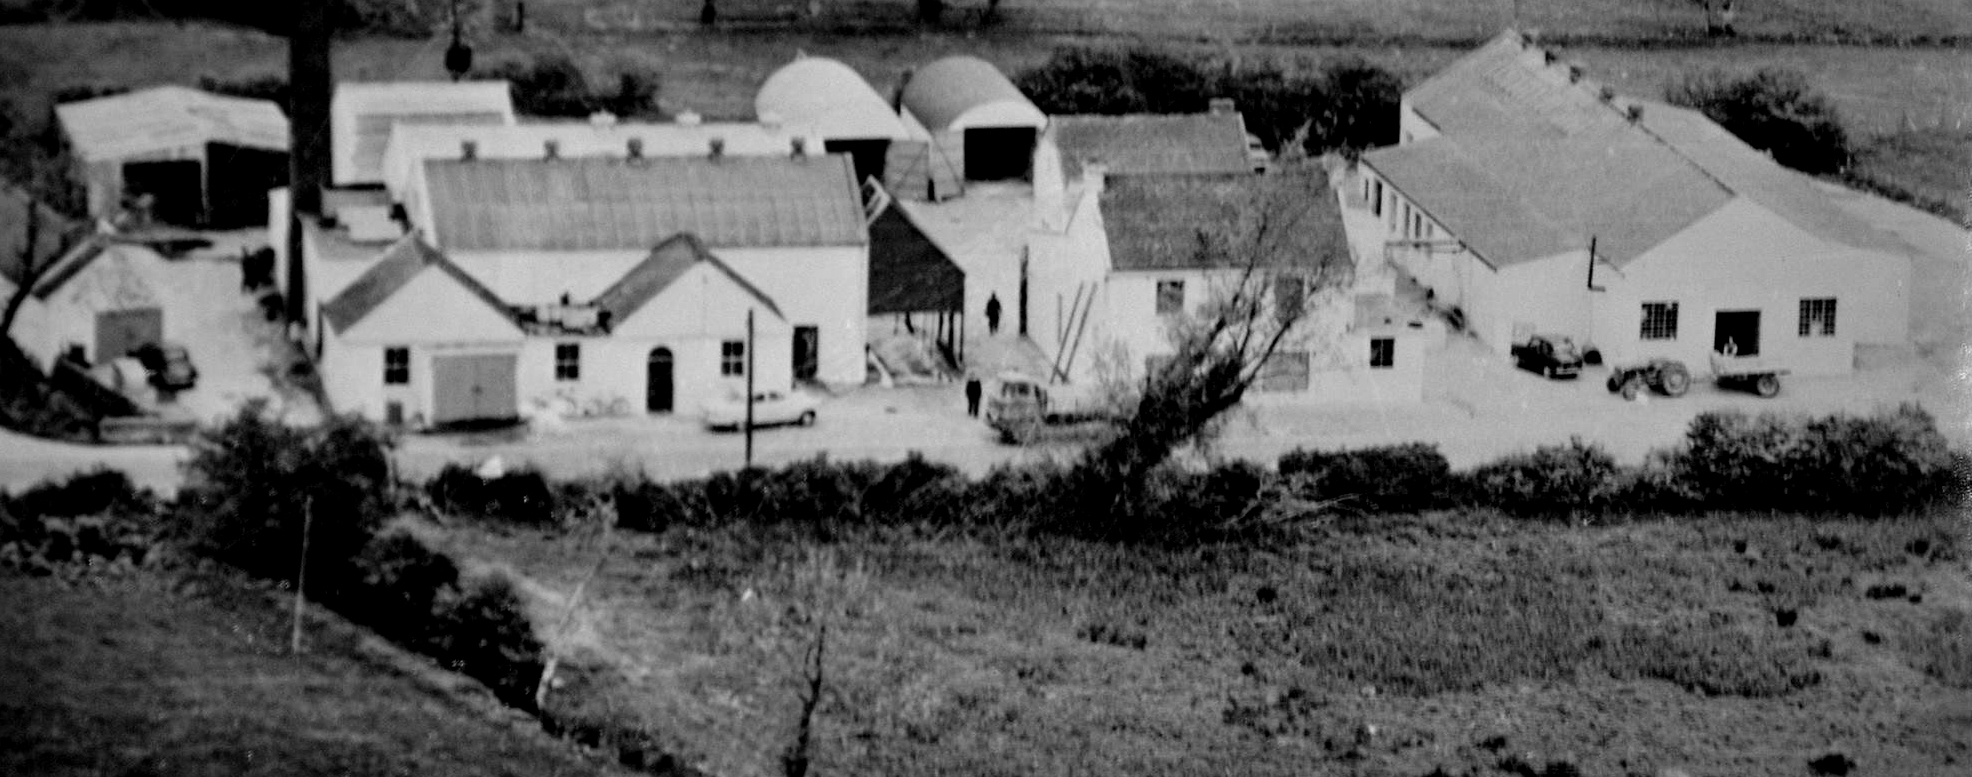 Achonry Creamery circa 1963